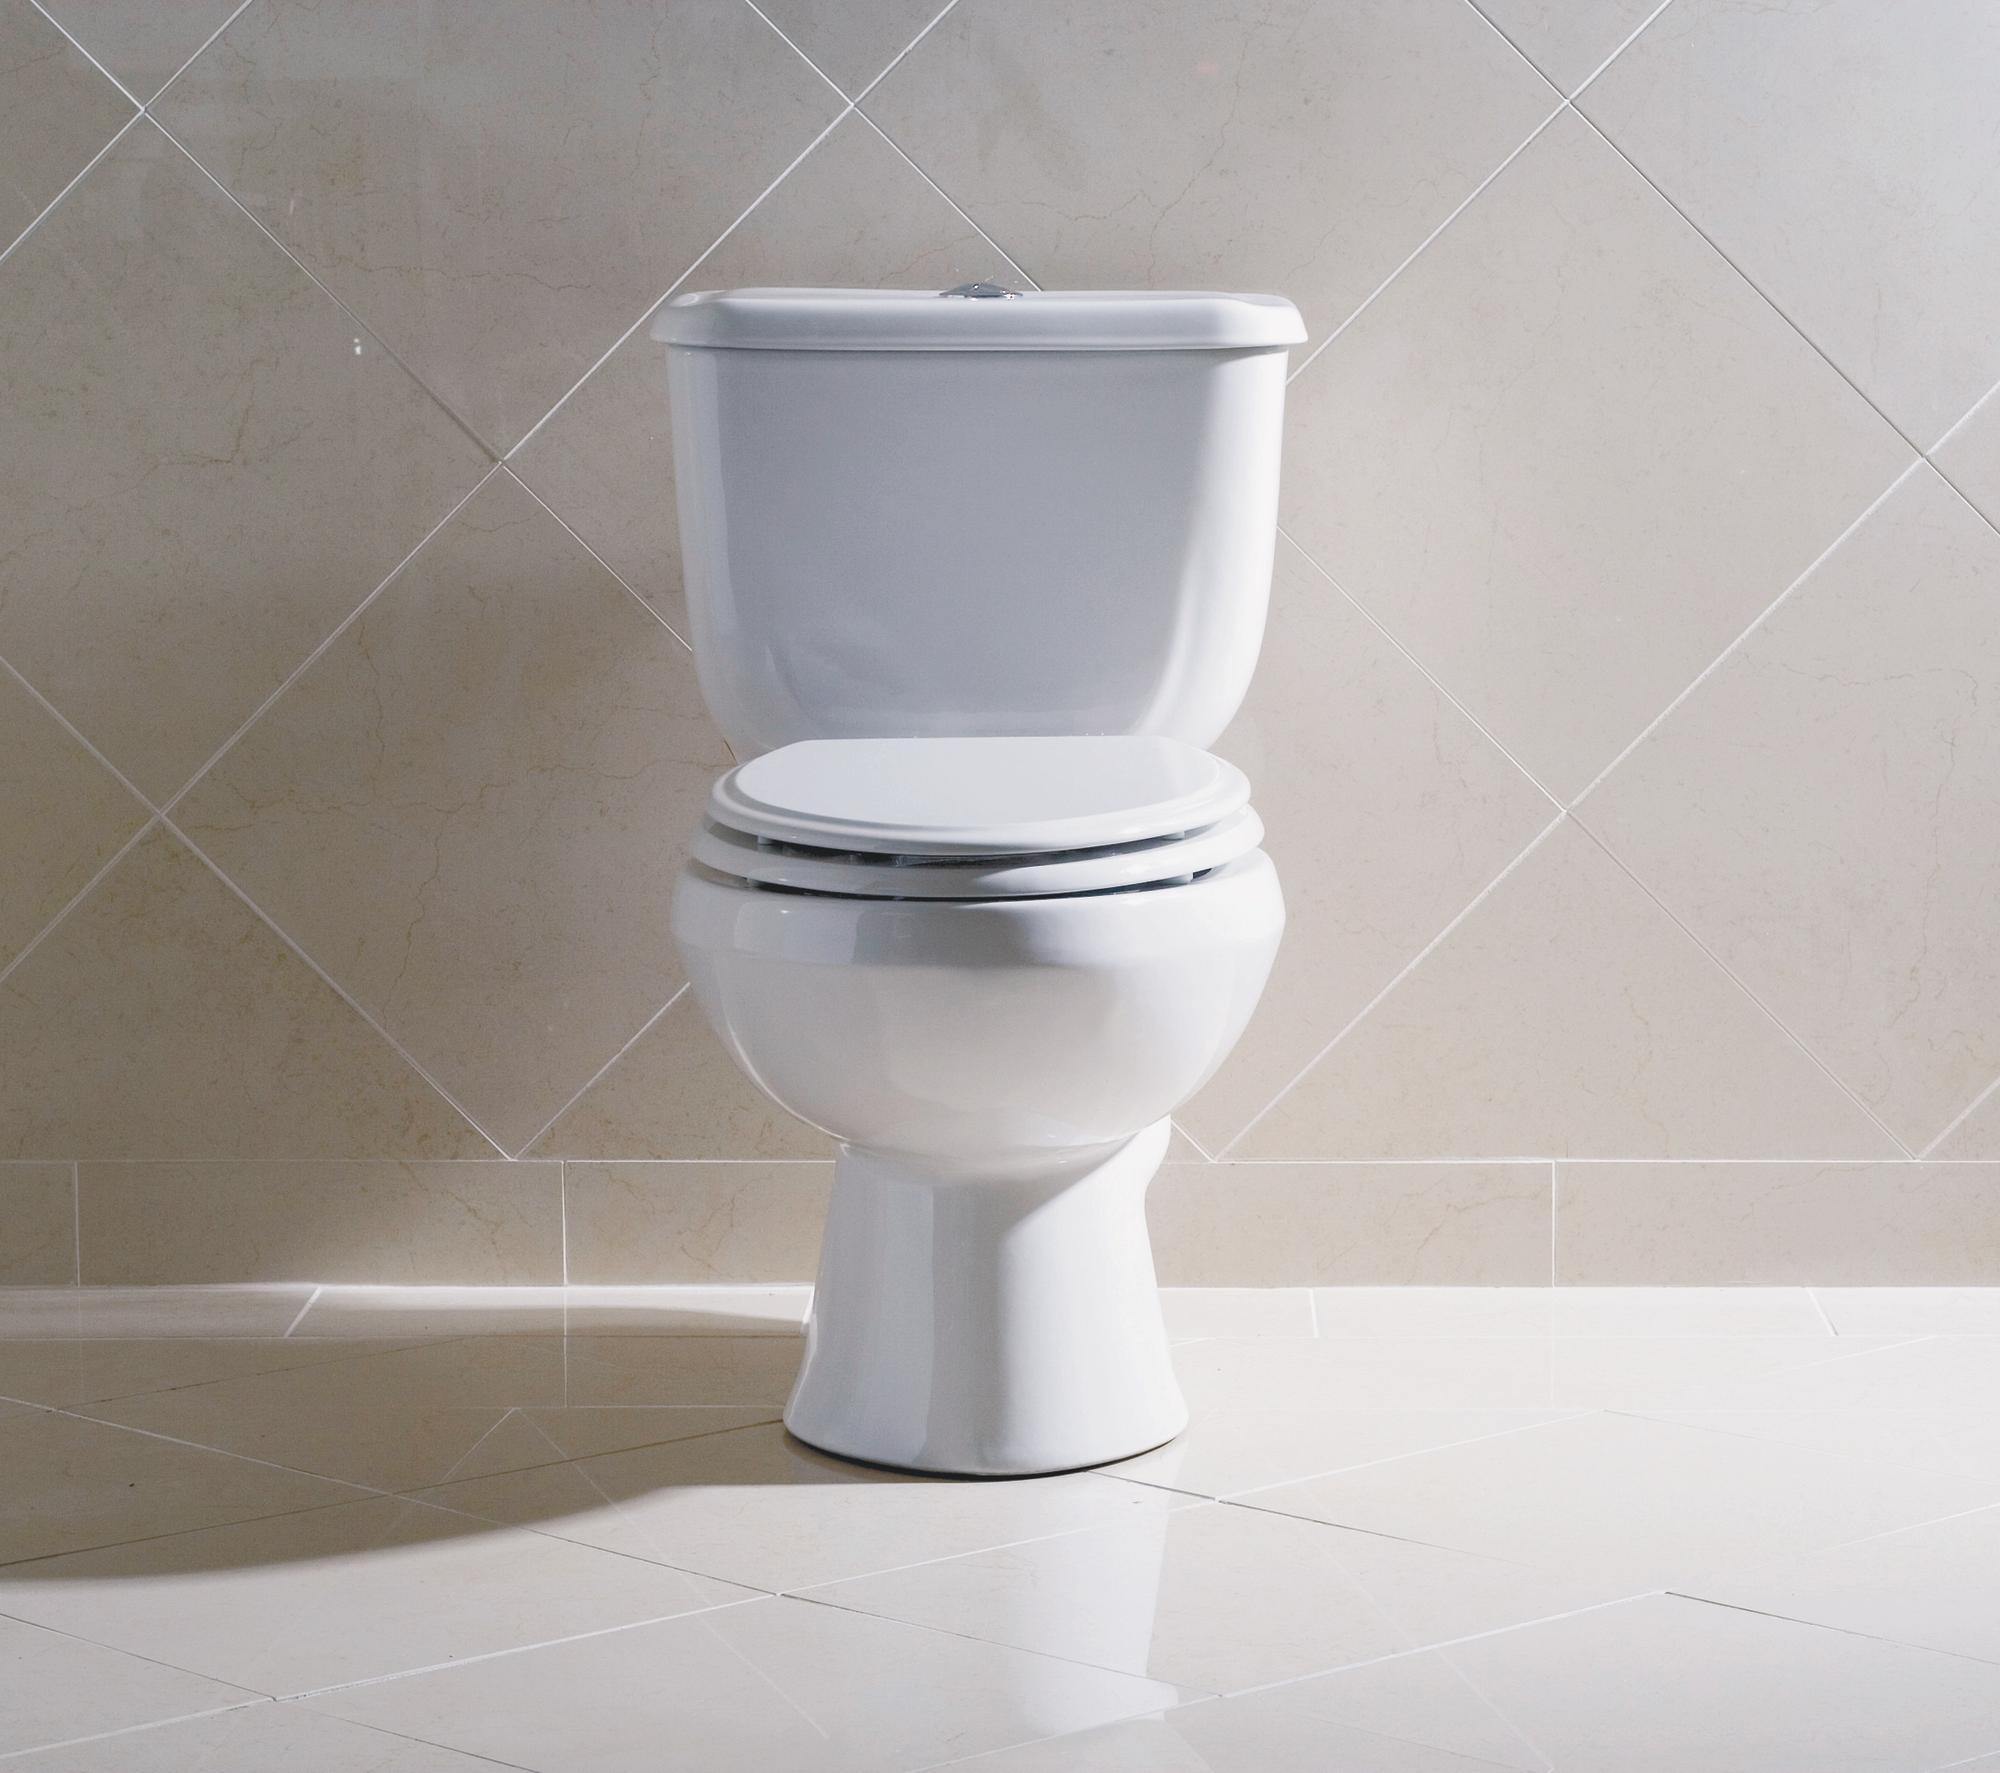 Briggs Toilet Review: 7006-130 Altima Elongated Toilet Express